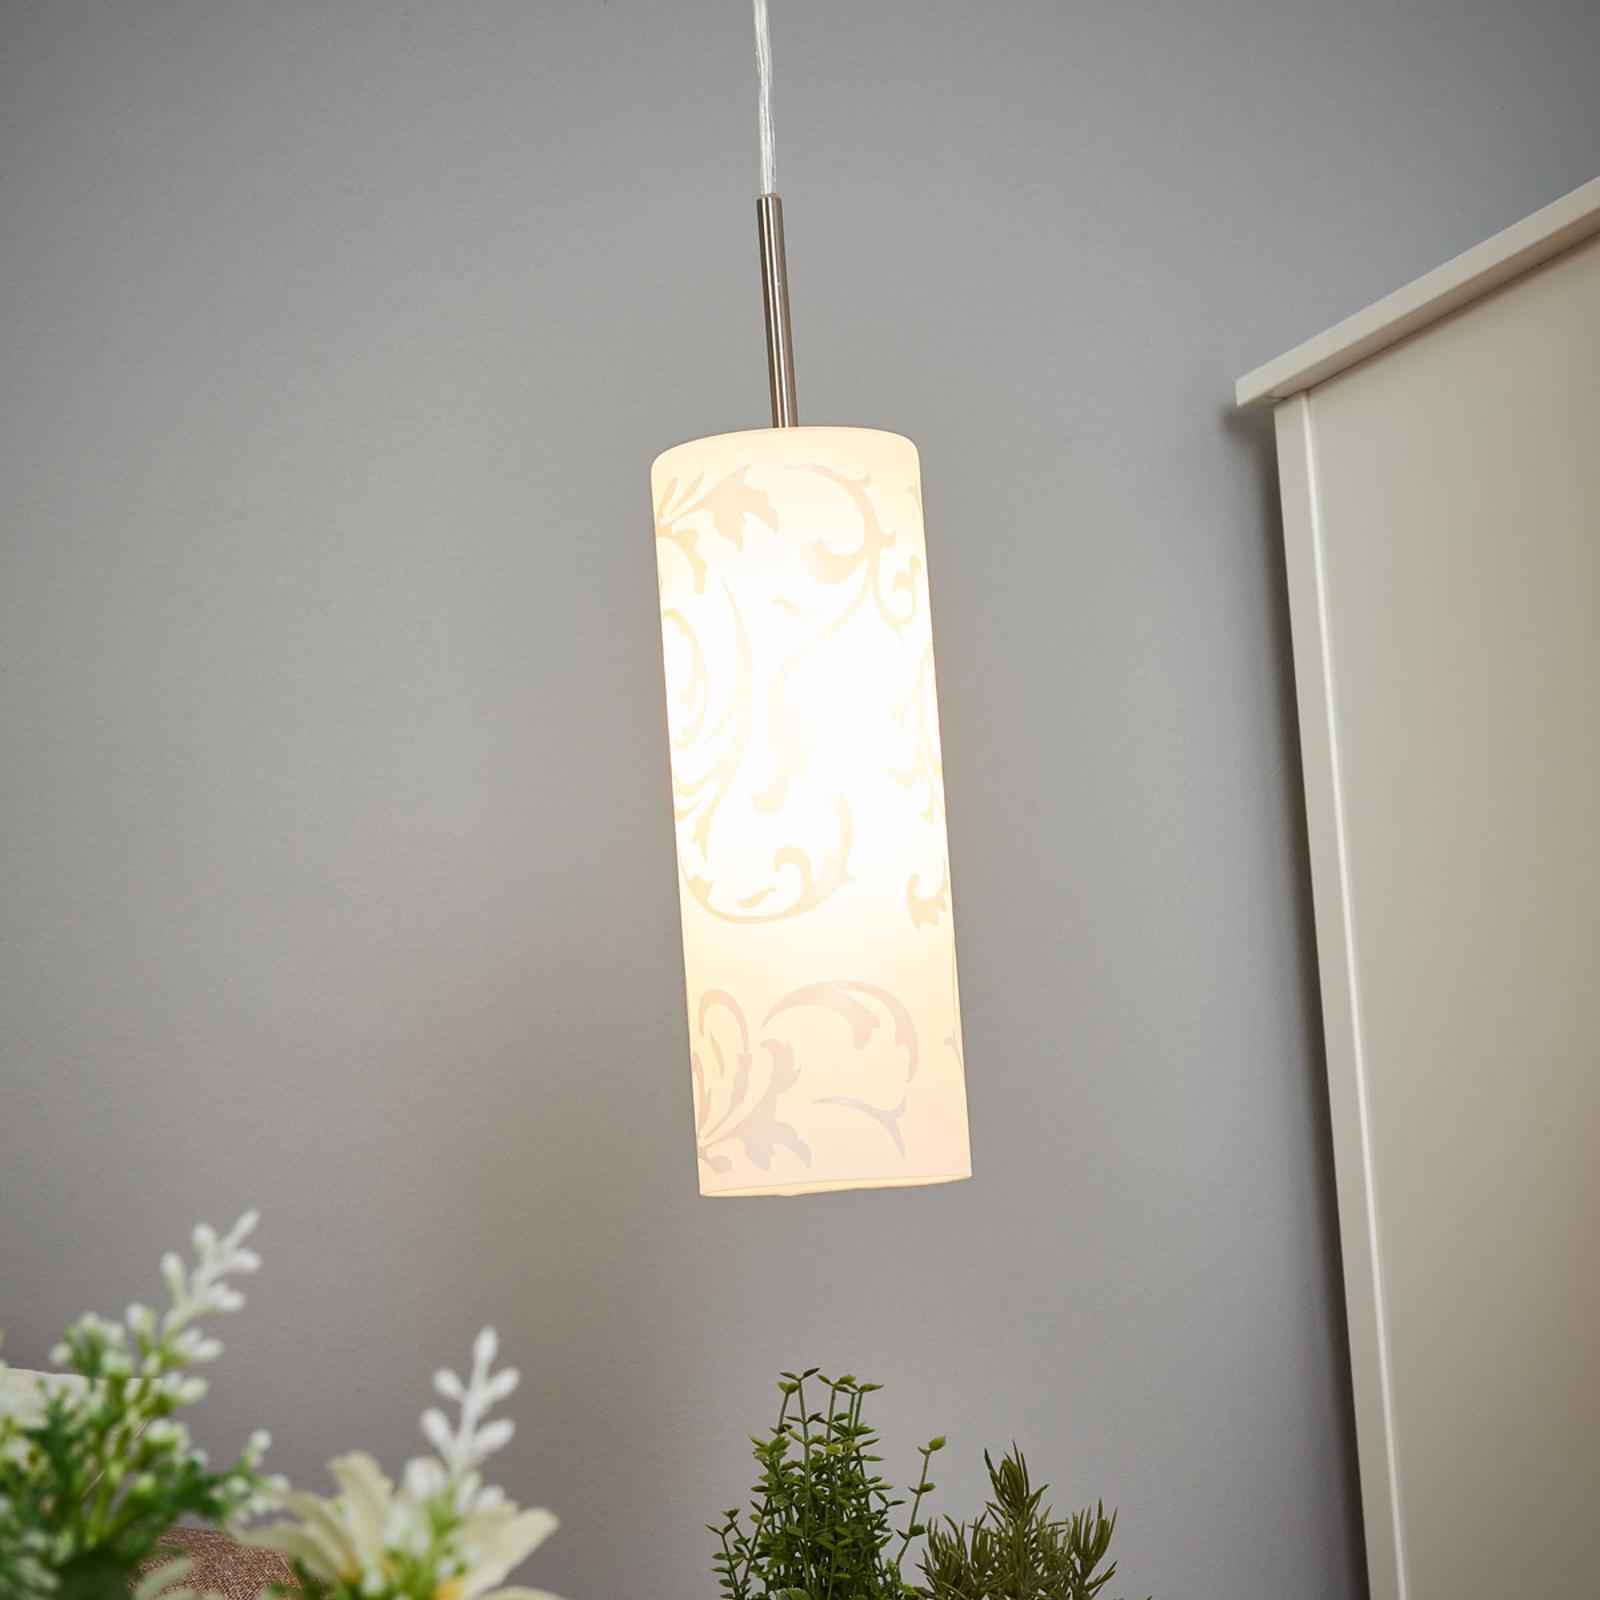 Amanda kunstzinnige hanglamp 1 lichts